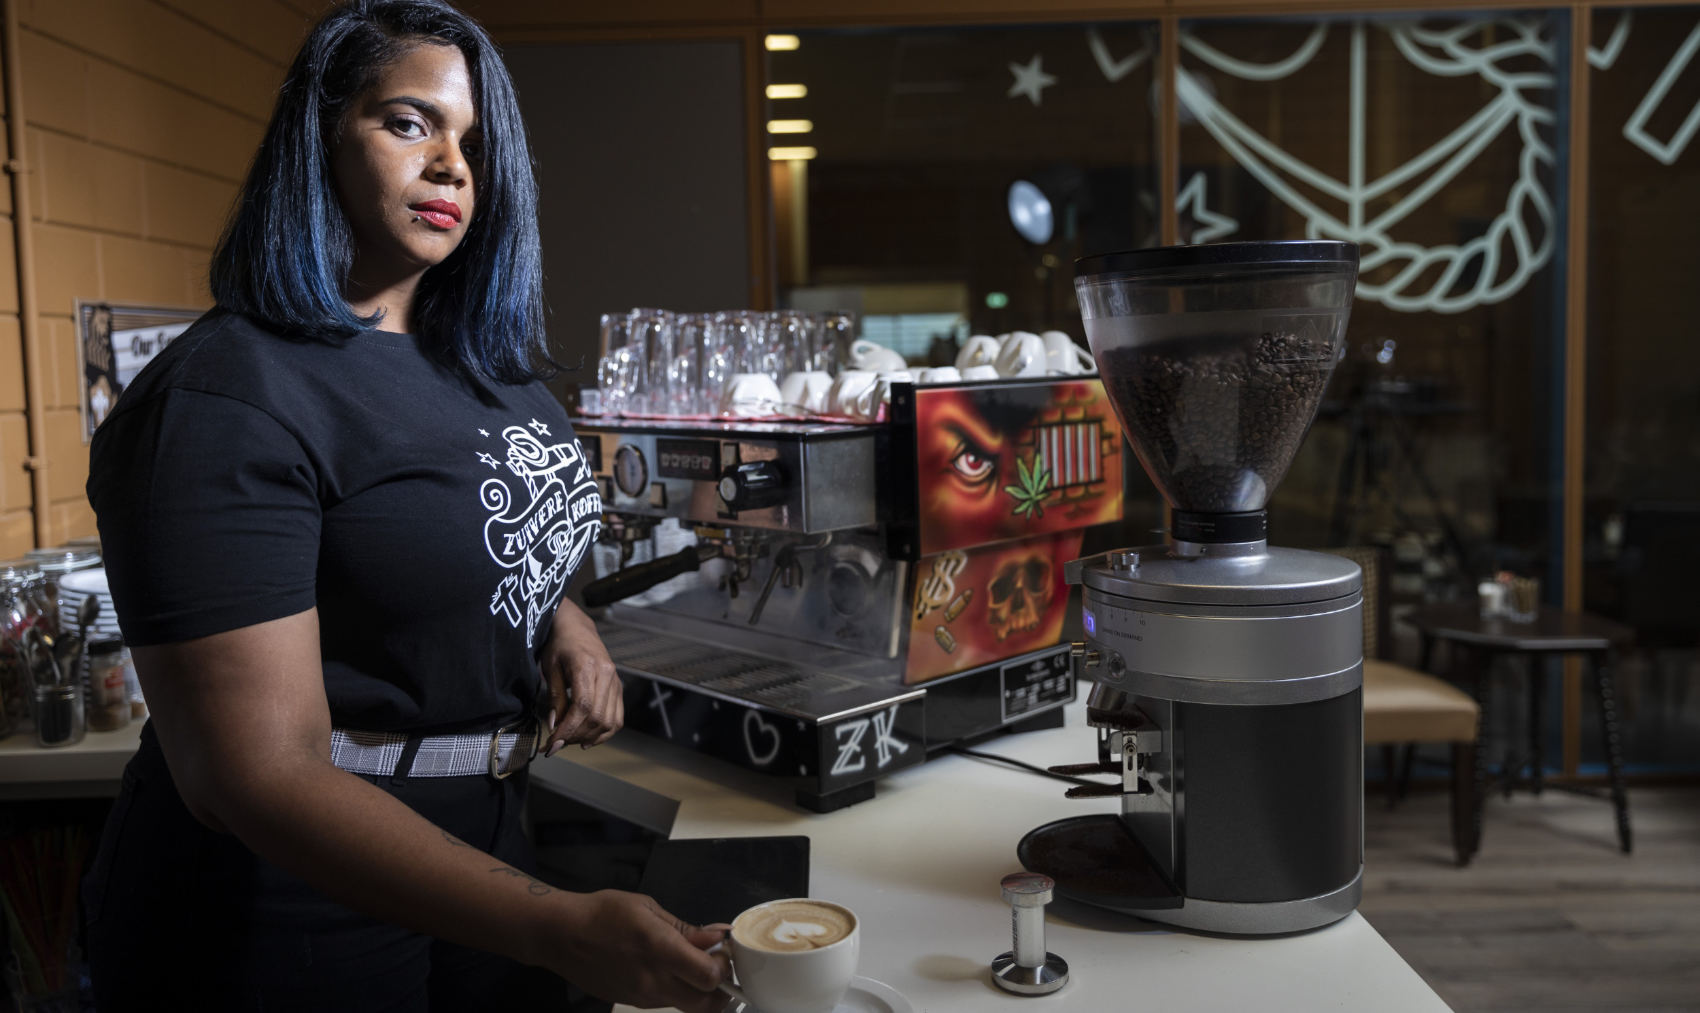 Koffiebranderij Zuivere Koffie